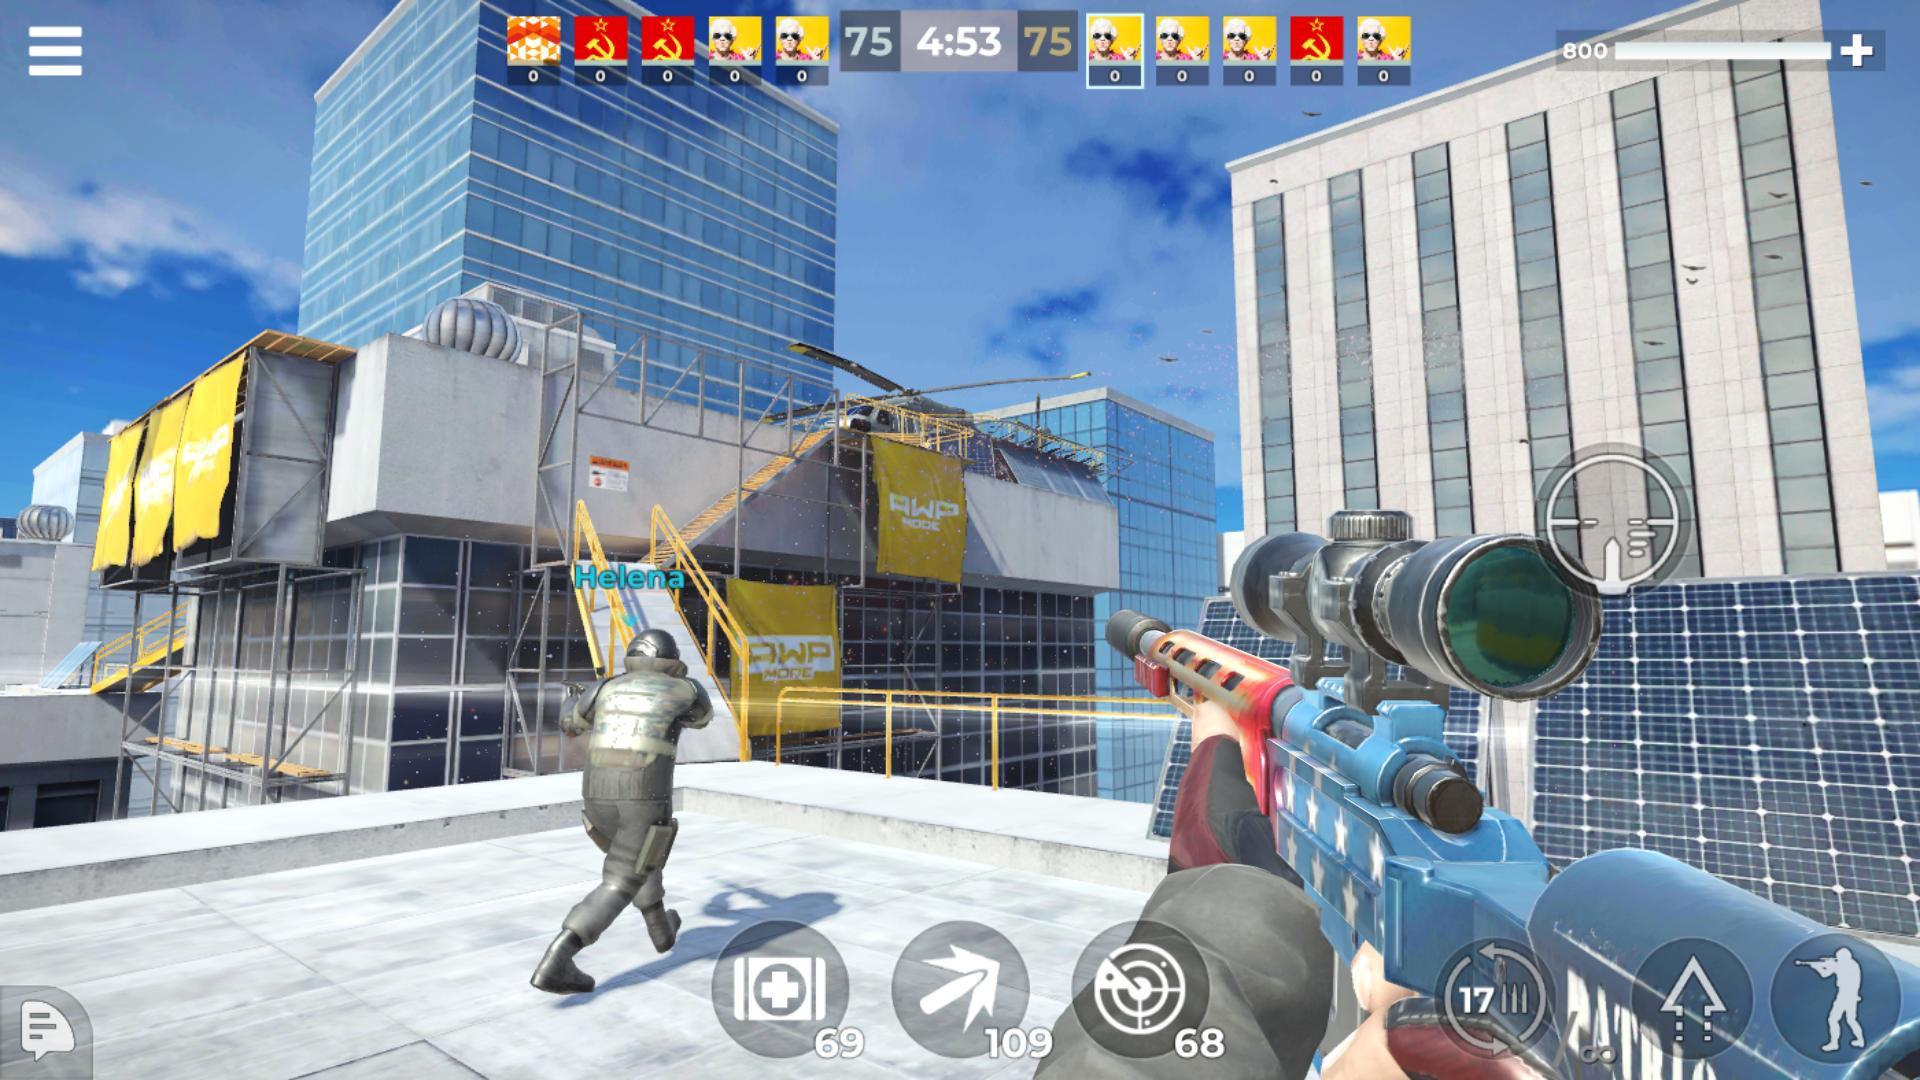 3D Gun Games No Download awp mode: elite online 3d fps for android - apk download